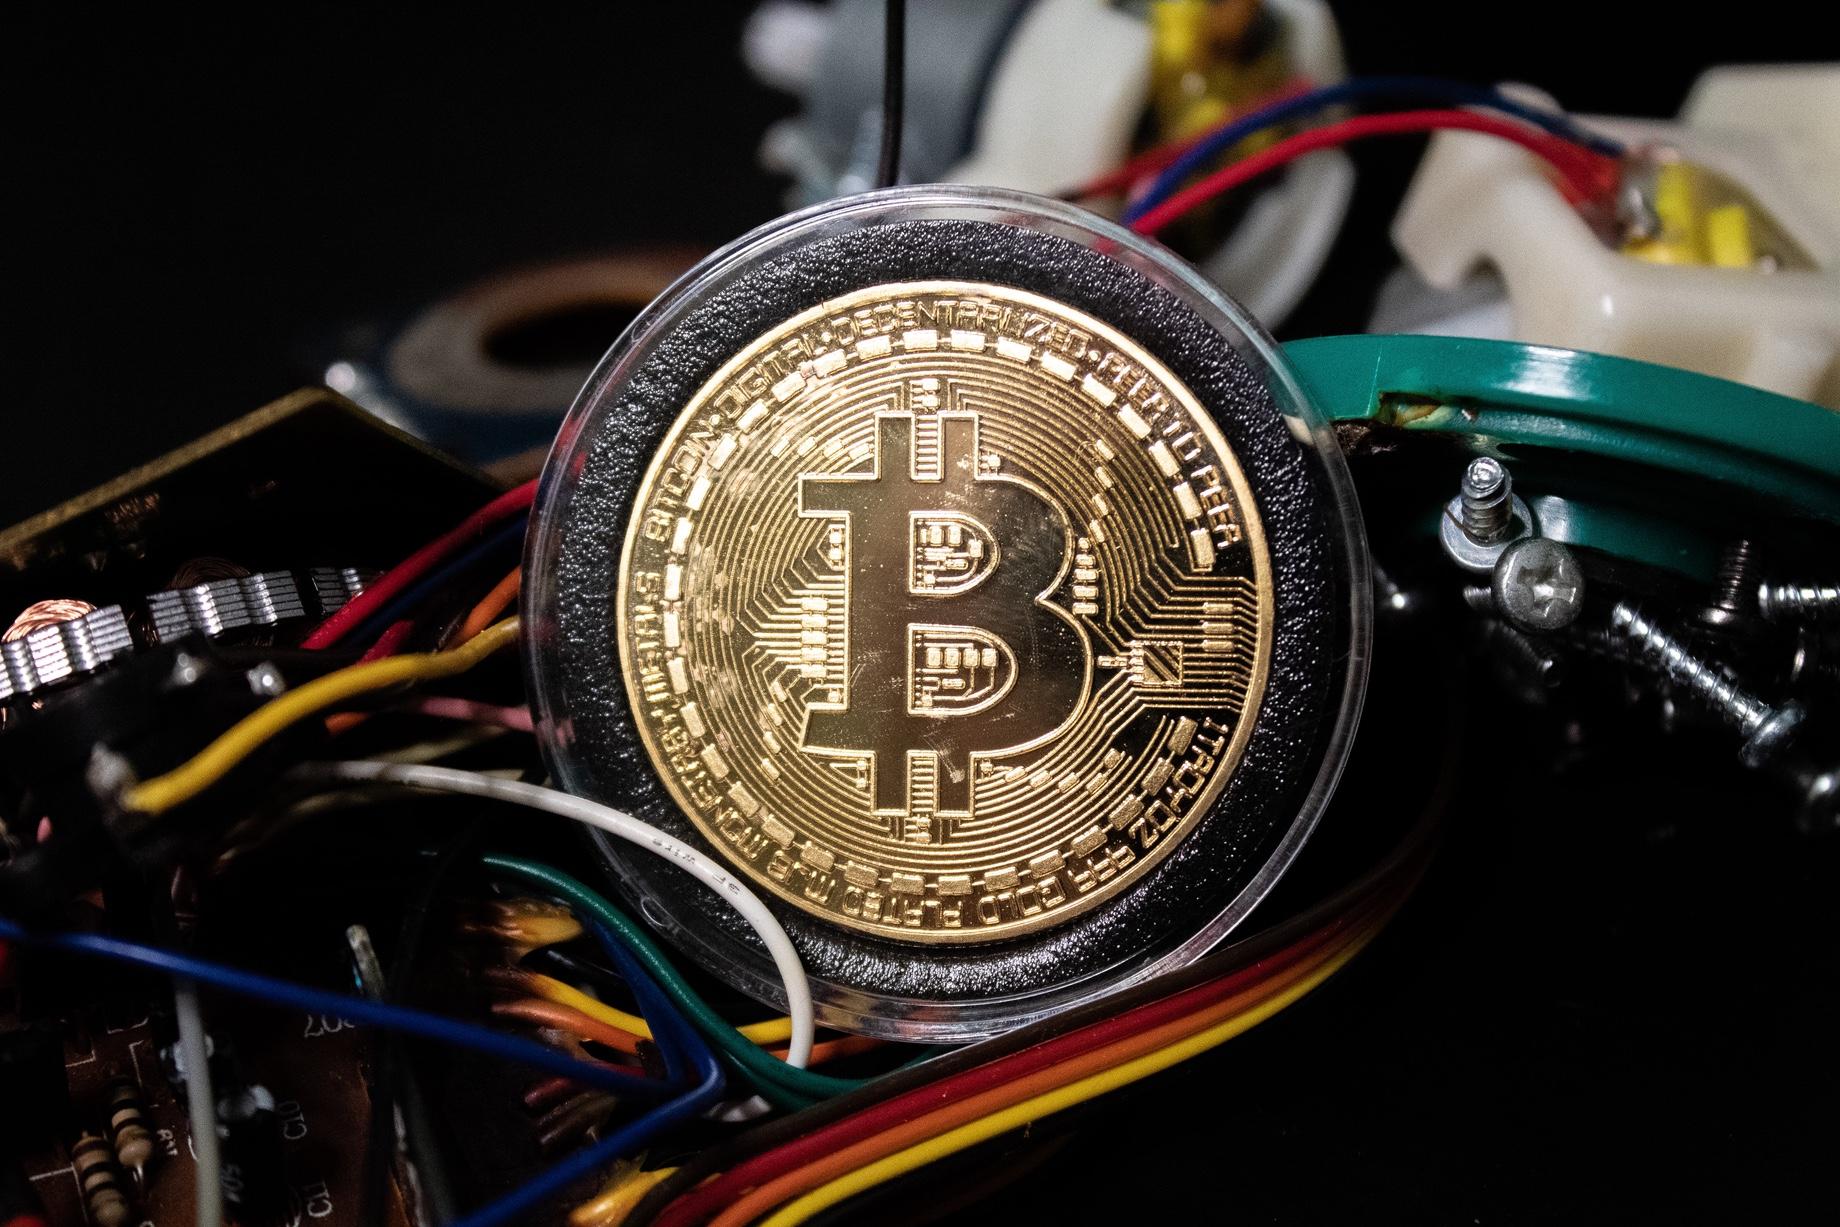 Bitcoin - Expand File Storing & Improve Record Keeping